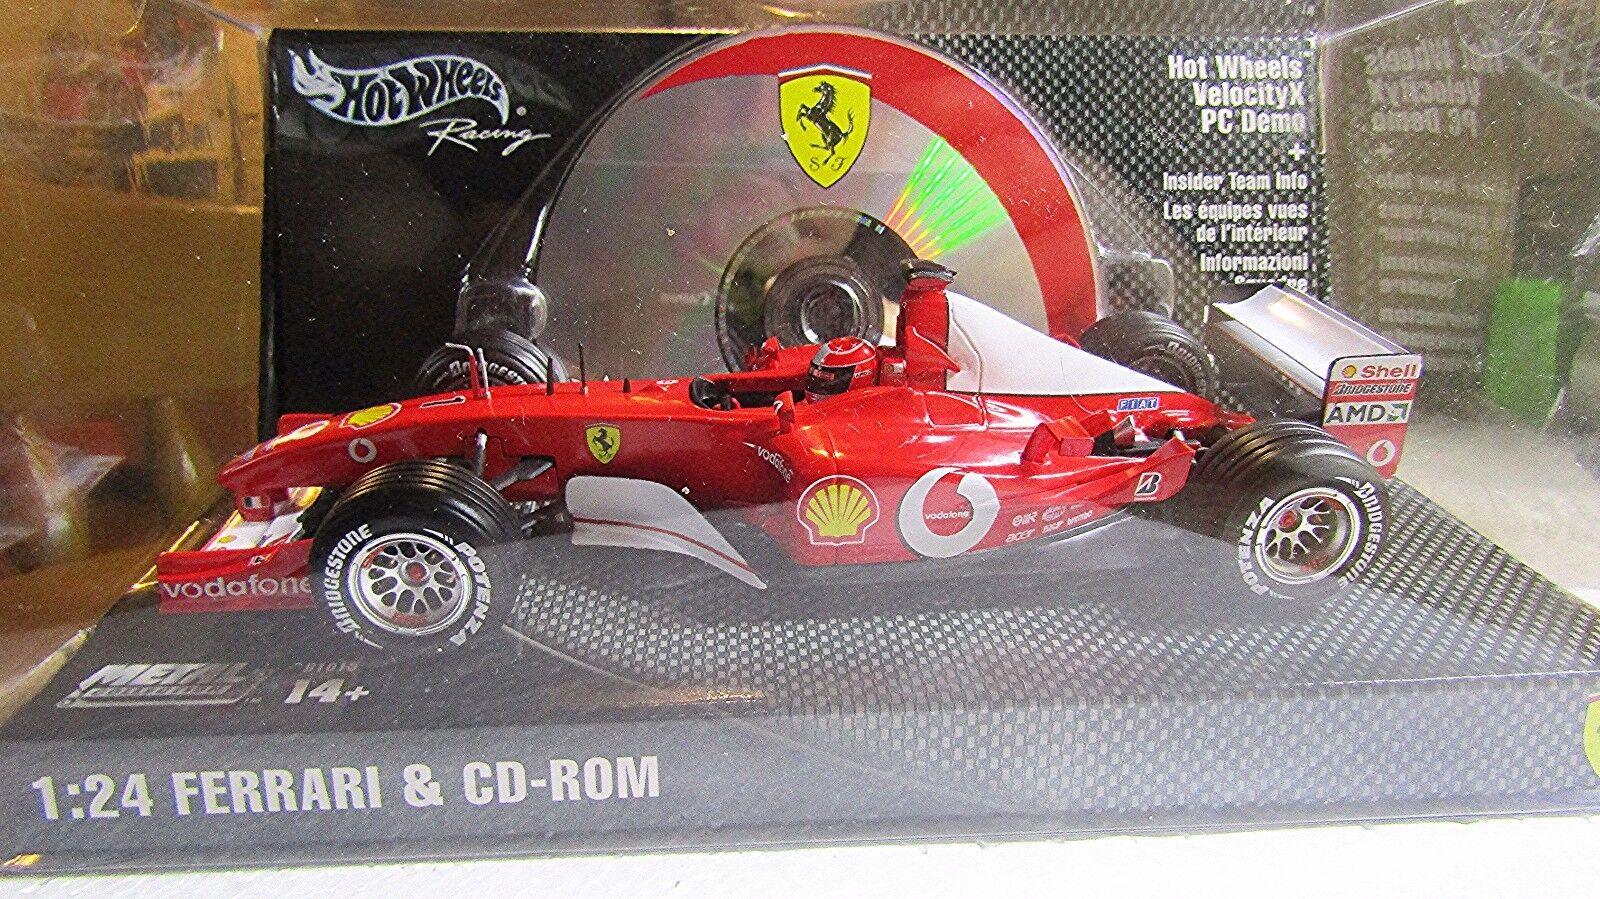 Hot Wheels Racing 1 24 Ferrari velocity x  Con Cd Rom  Rojo